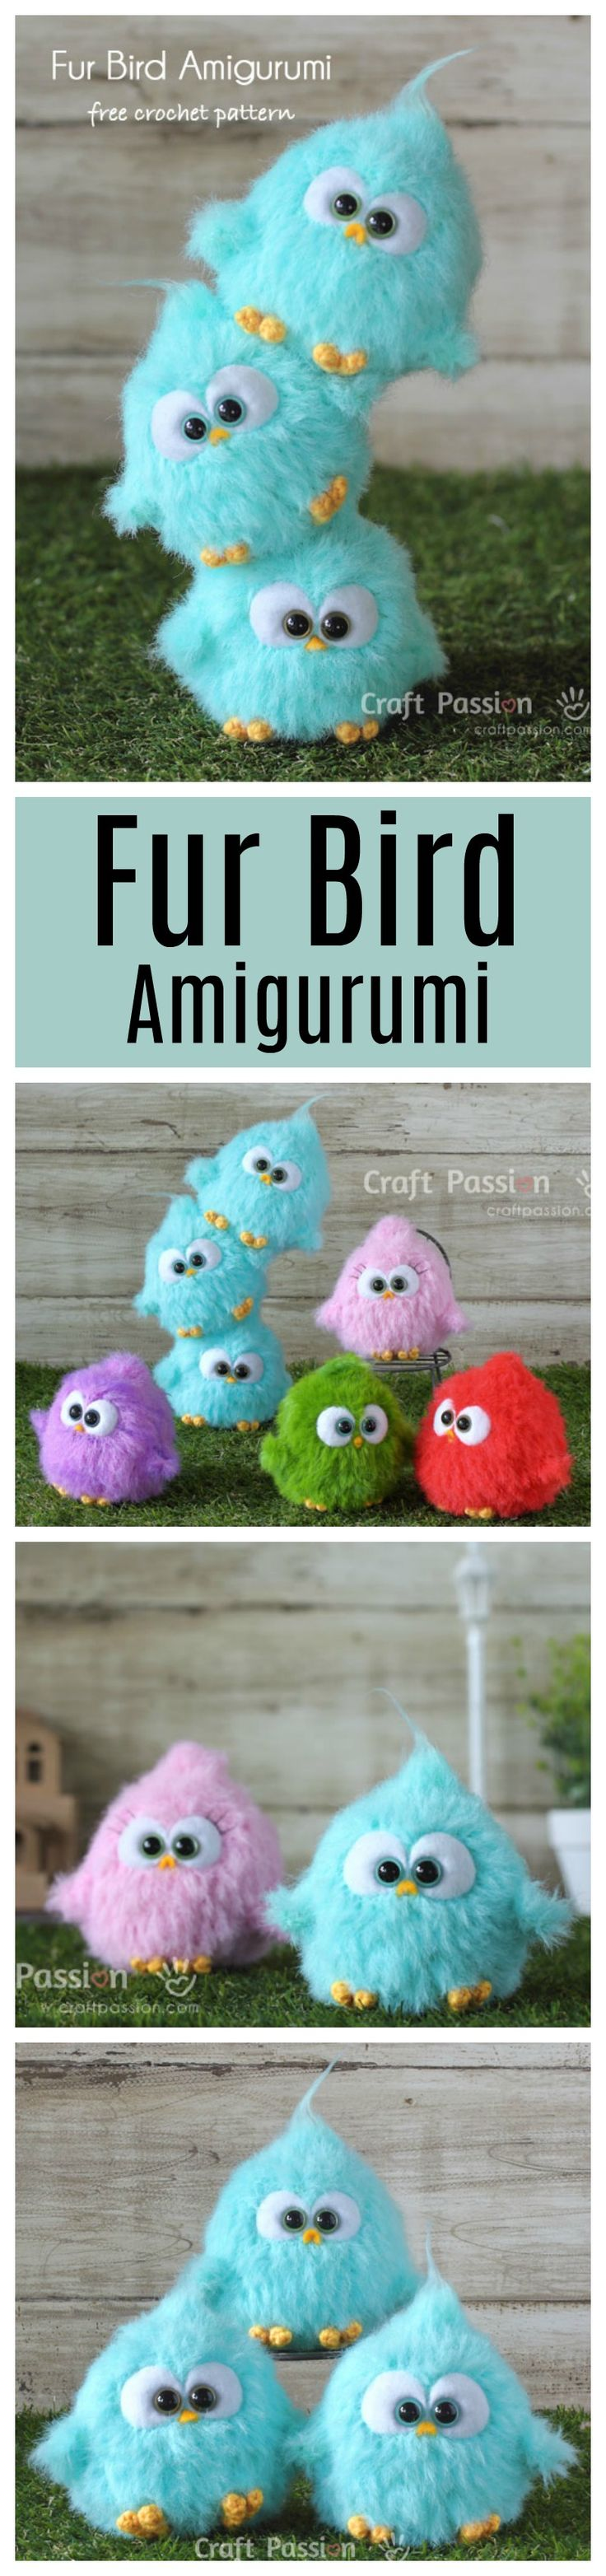 Free crochet pattern: fur bird amigurumi